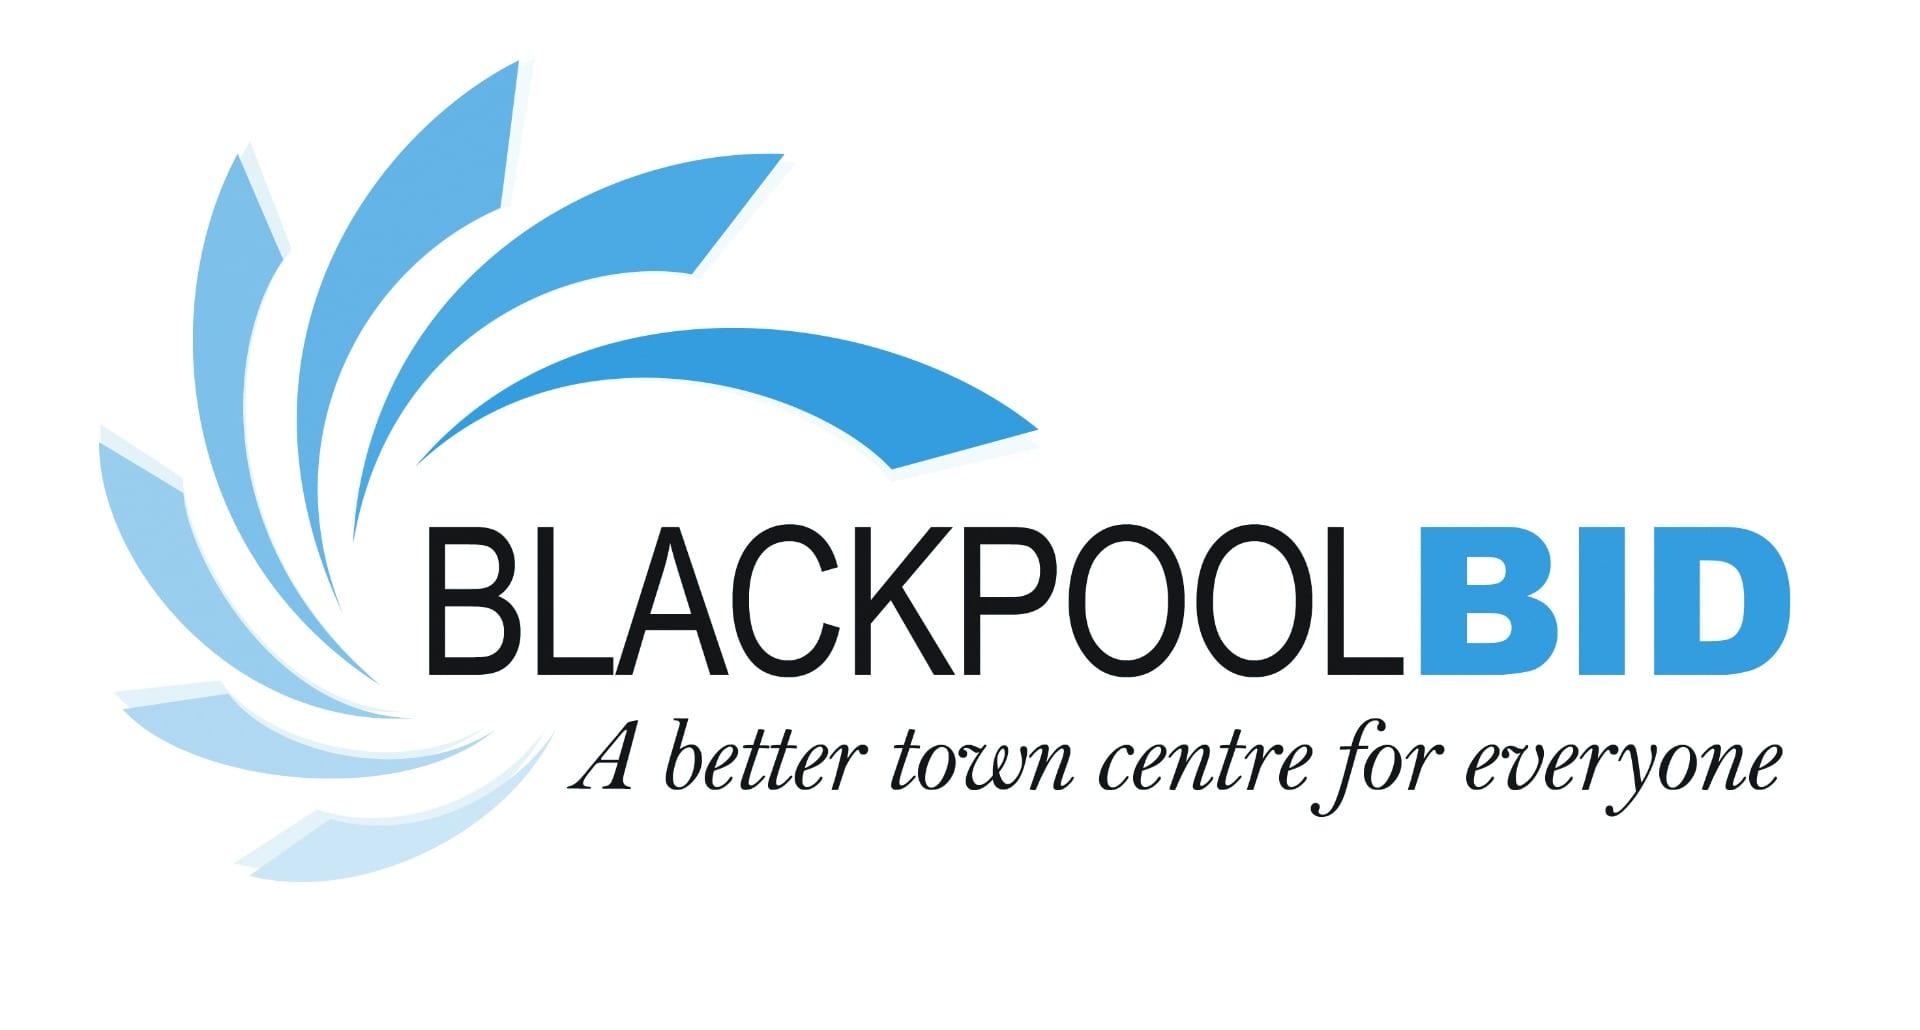 Blackpool Christmas Lights Switch On with Blackpool BID